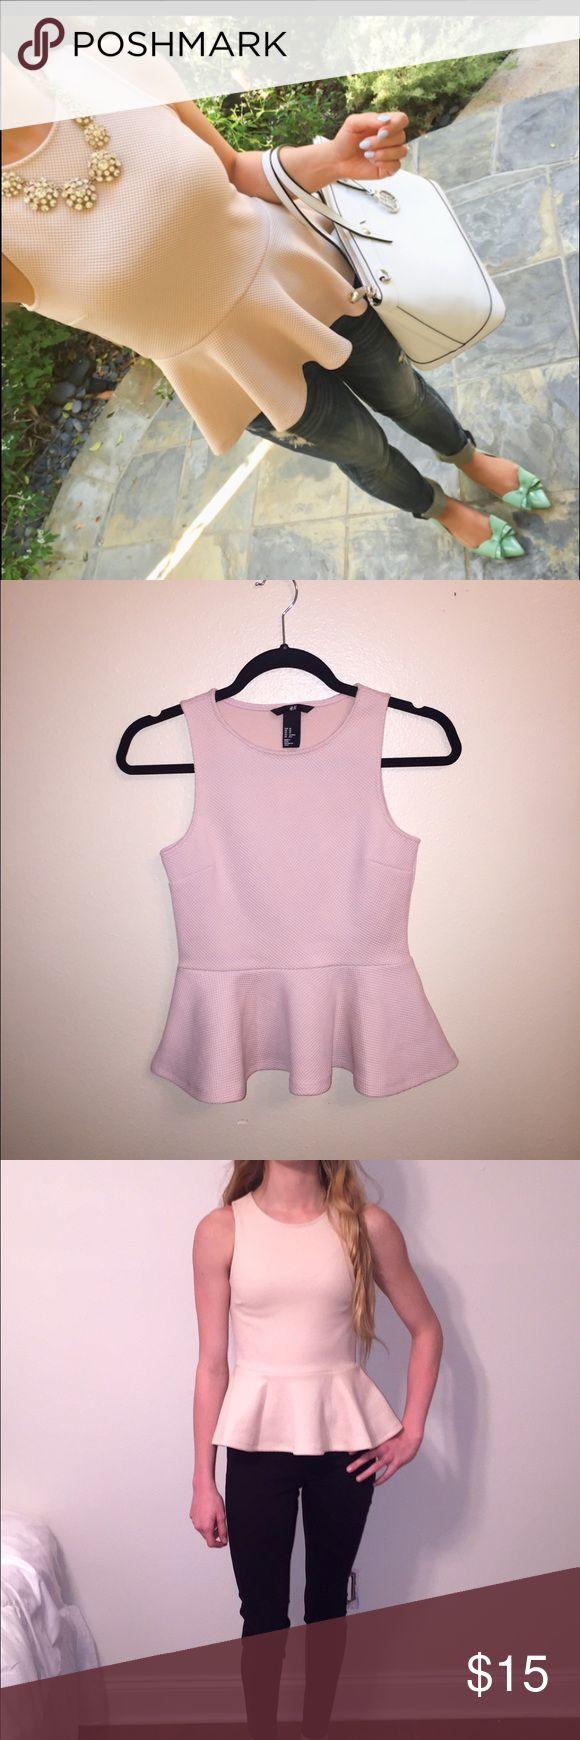 H&m pale pink sleeveless peplum top! XS Precious H&M pale pink sleeveless peplum top! NWT! Never worn! H&M Tops